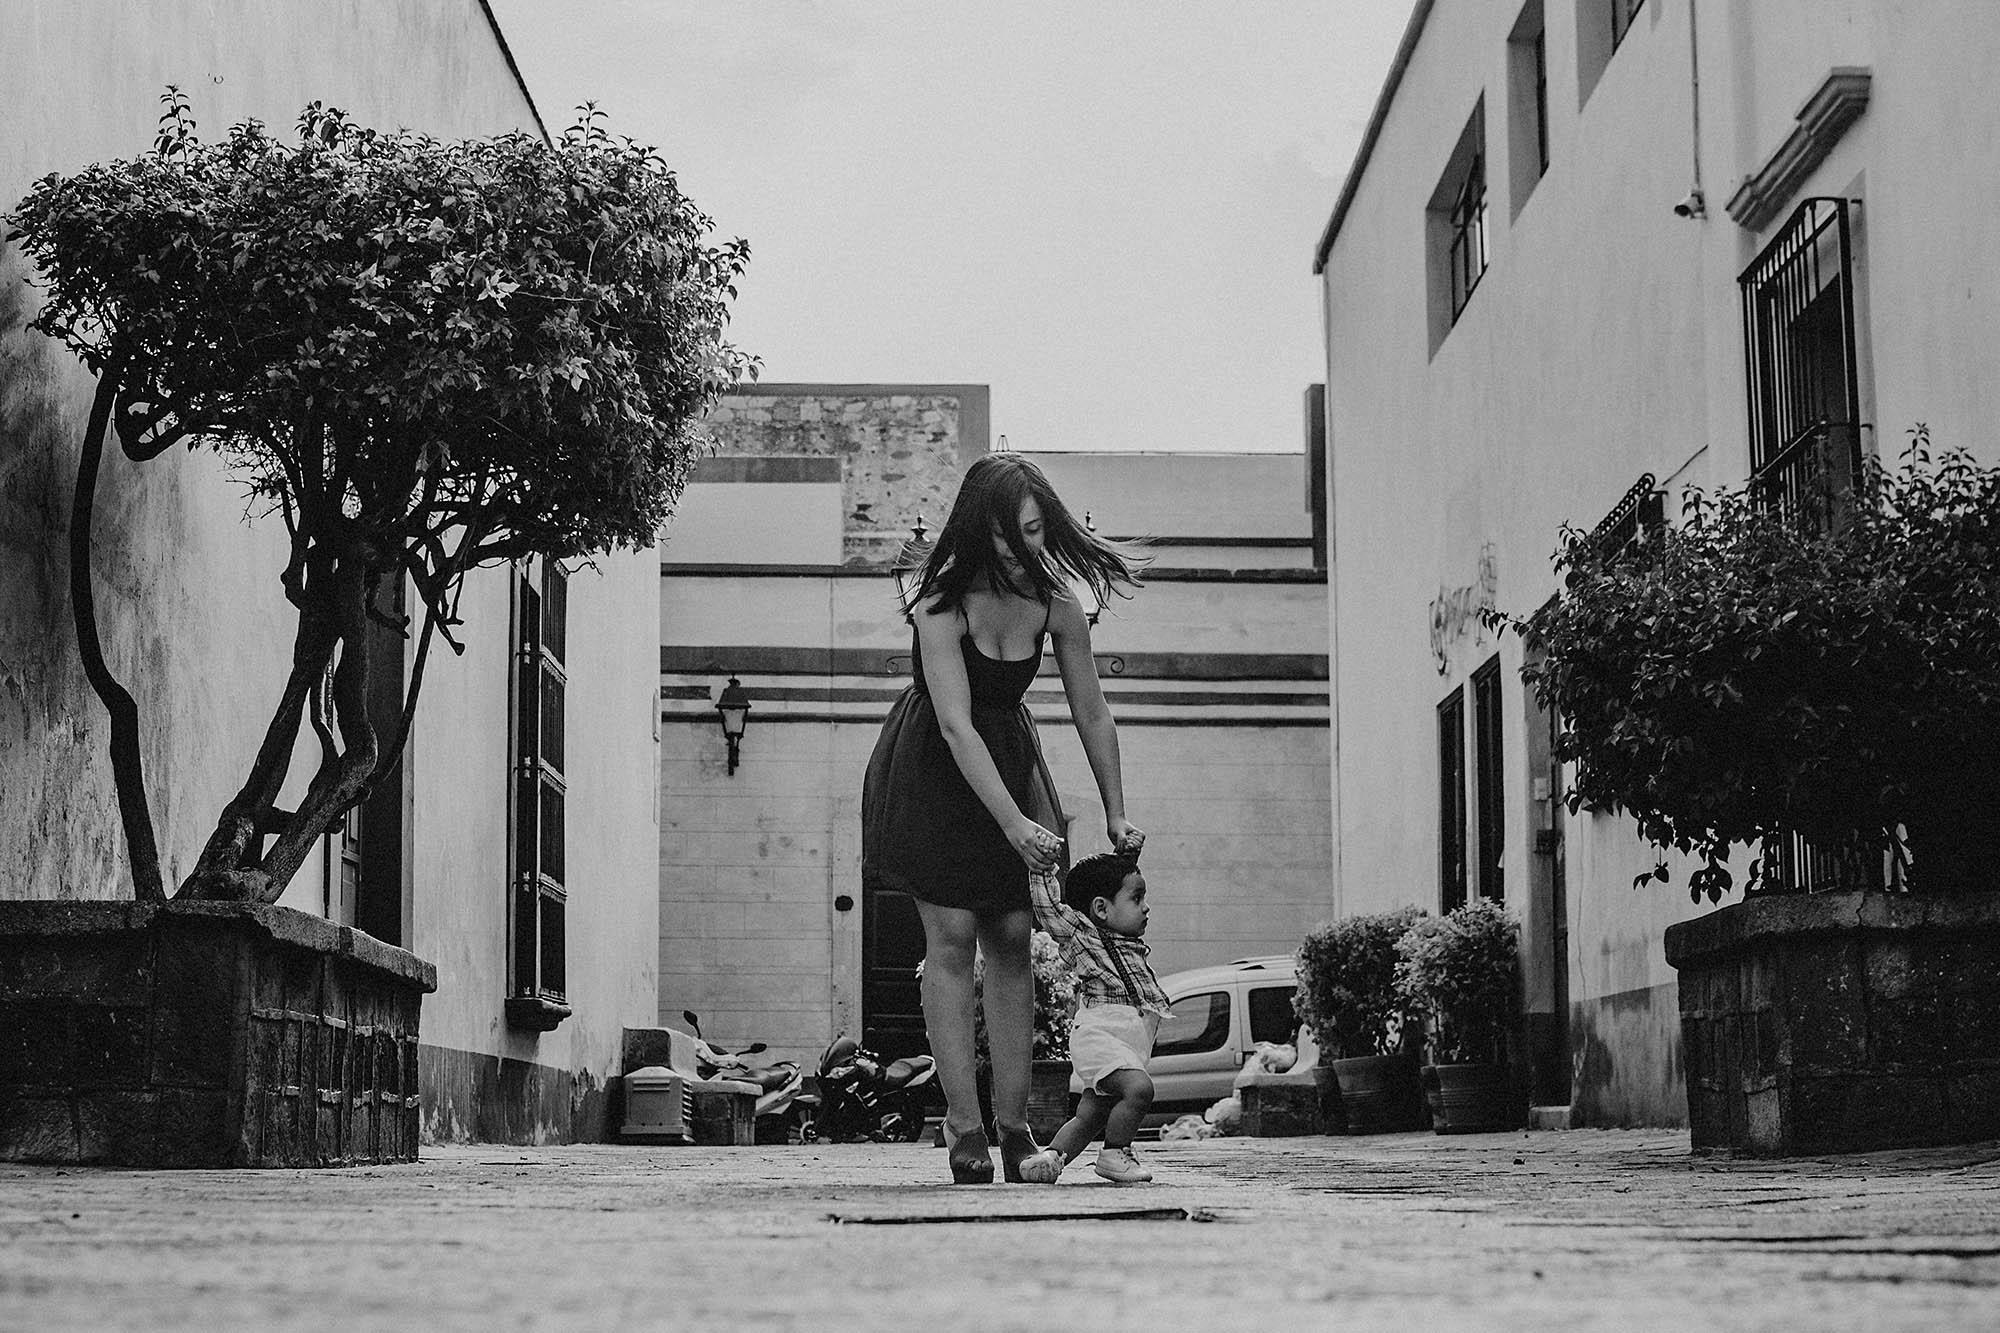 fotografo-de-familia-Queretaro-Daniela-Sohe-9.jpg